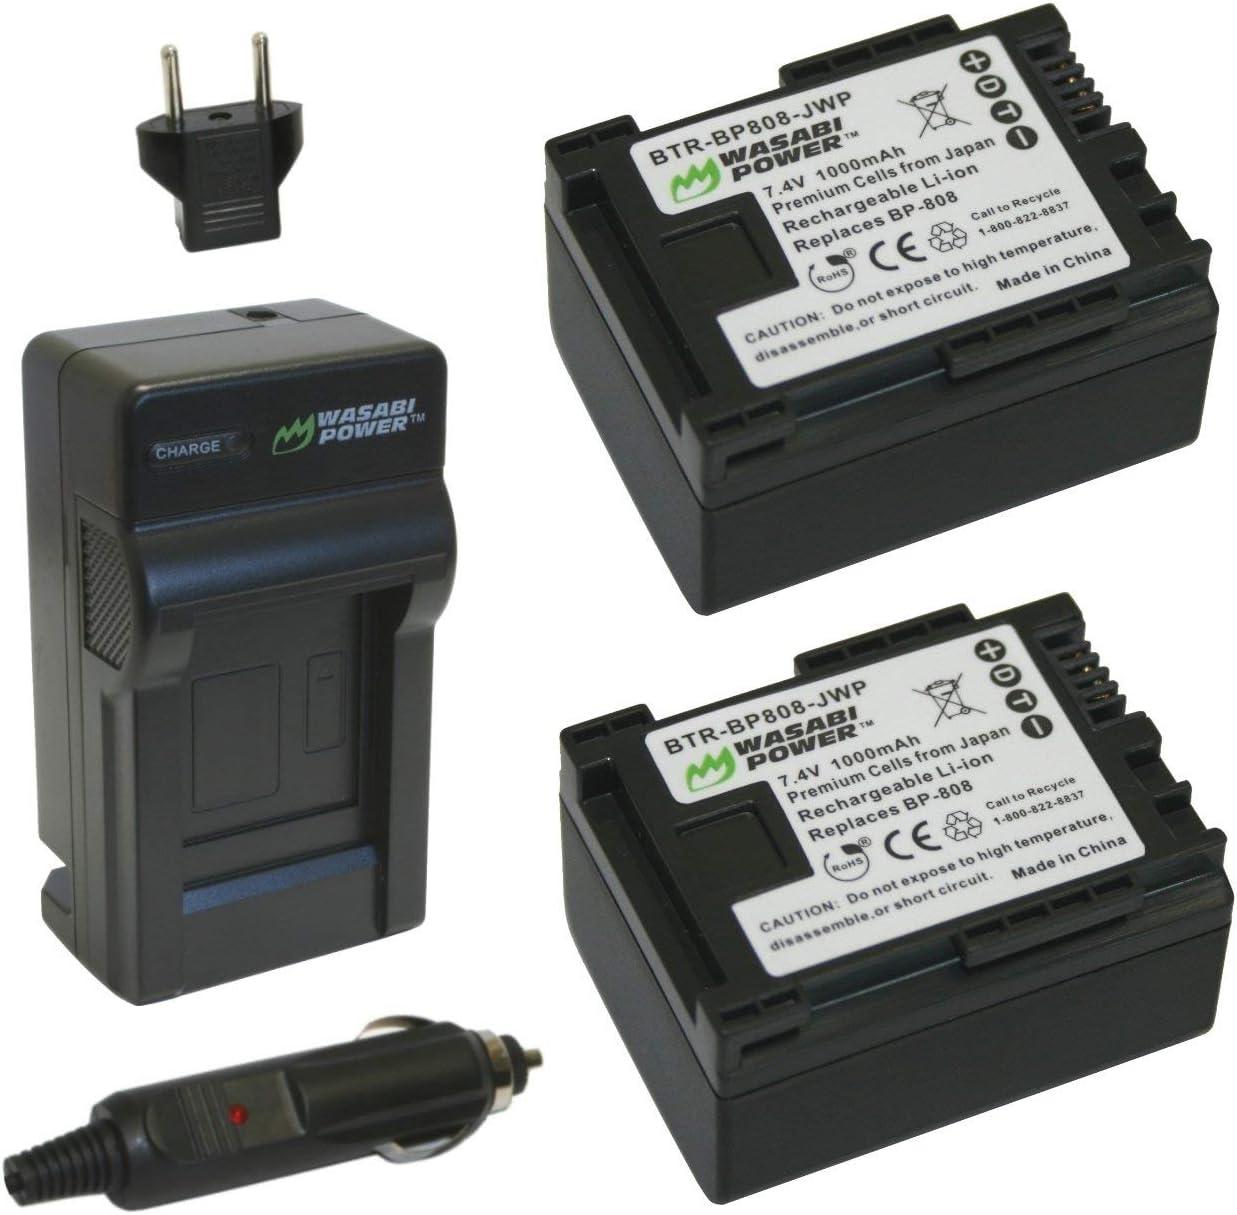 HF M30 2-Pack HF G20 HF M300 HF M41 HF M40 FS40 and Charger for Canon FS21 BP-809 Battery HF M31 VIXIA HF G10 BP-808 FS400 HF M32 FS200 FS22 and More FS31 FS300 Wasabi Power BP-807